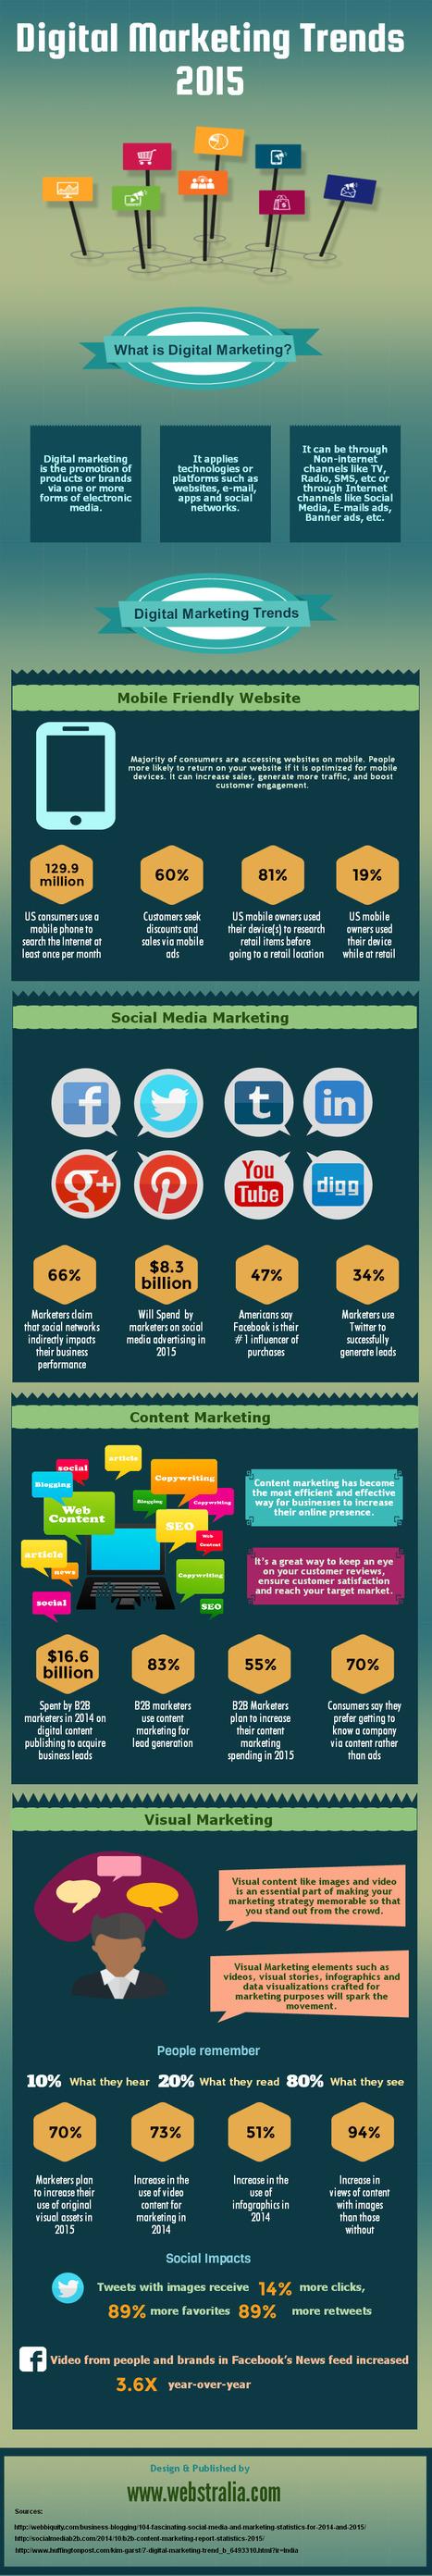 Digital marketing trends 2015 - Infographic | Webstralia - IT Solutions | Scoop.it